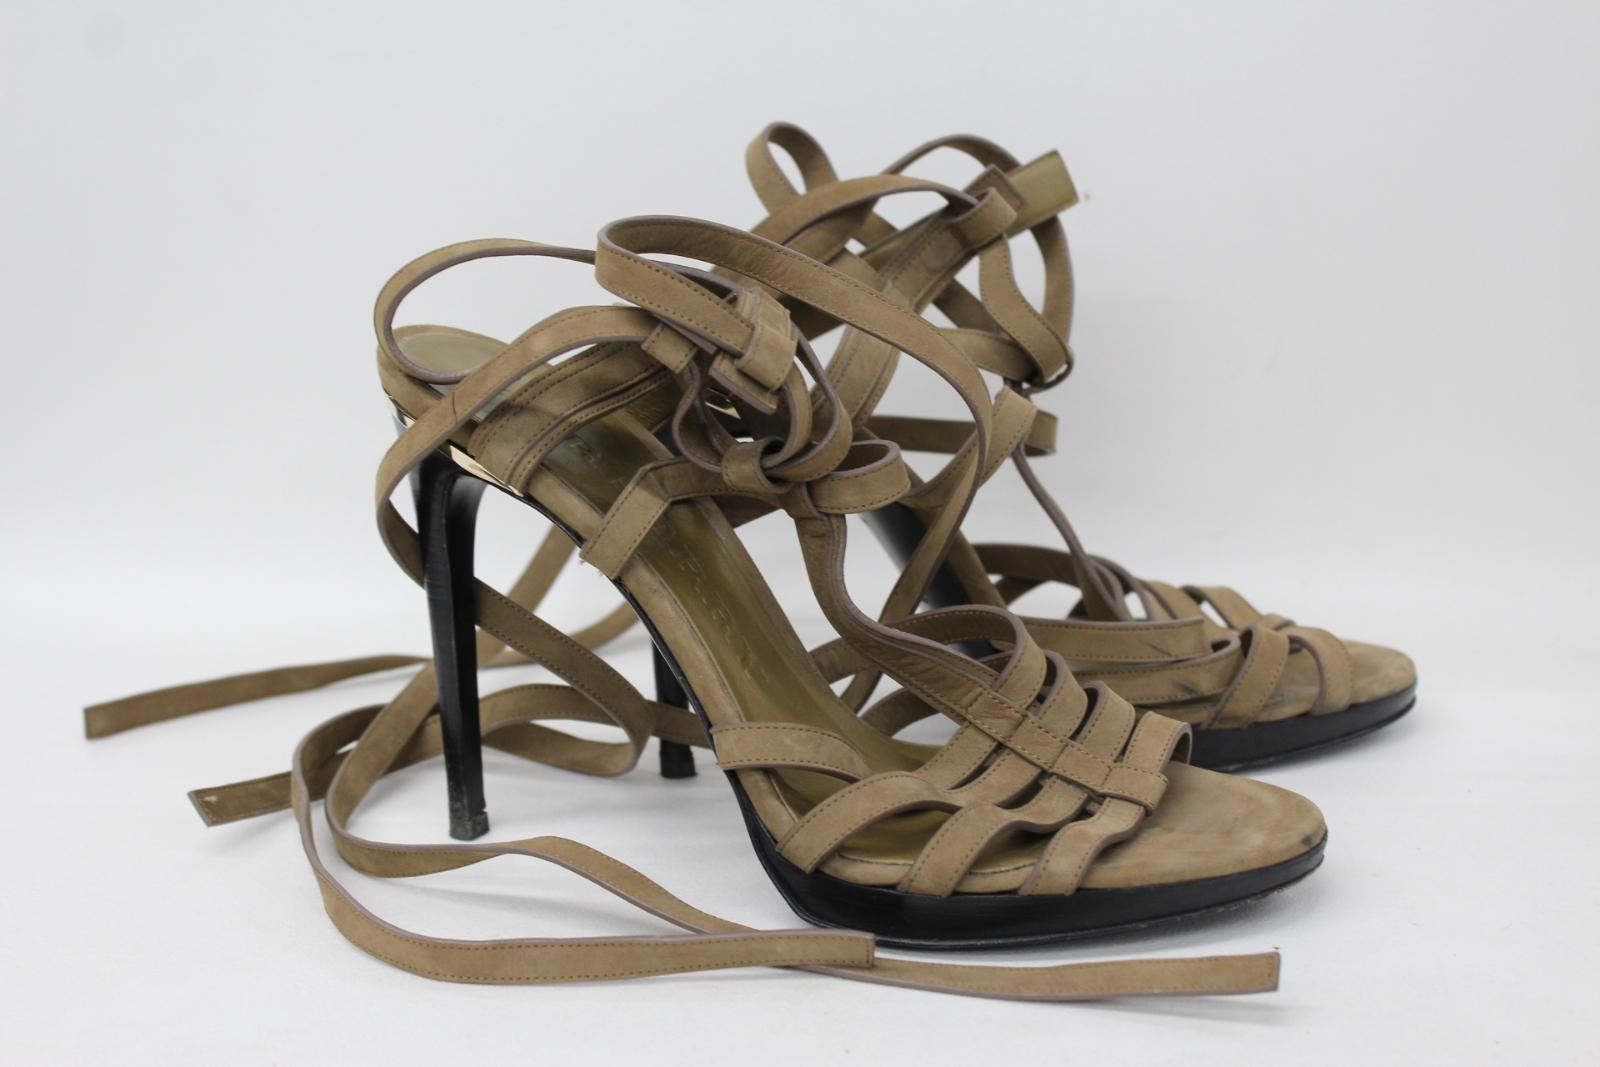 BURBERRY-Ladies-Khaki-Nubuck-Leather-Stiletto-Heel-Strappy-Sandals-EU40-UK7